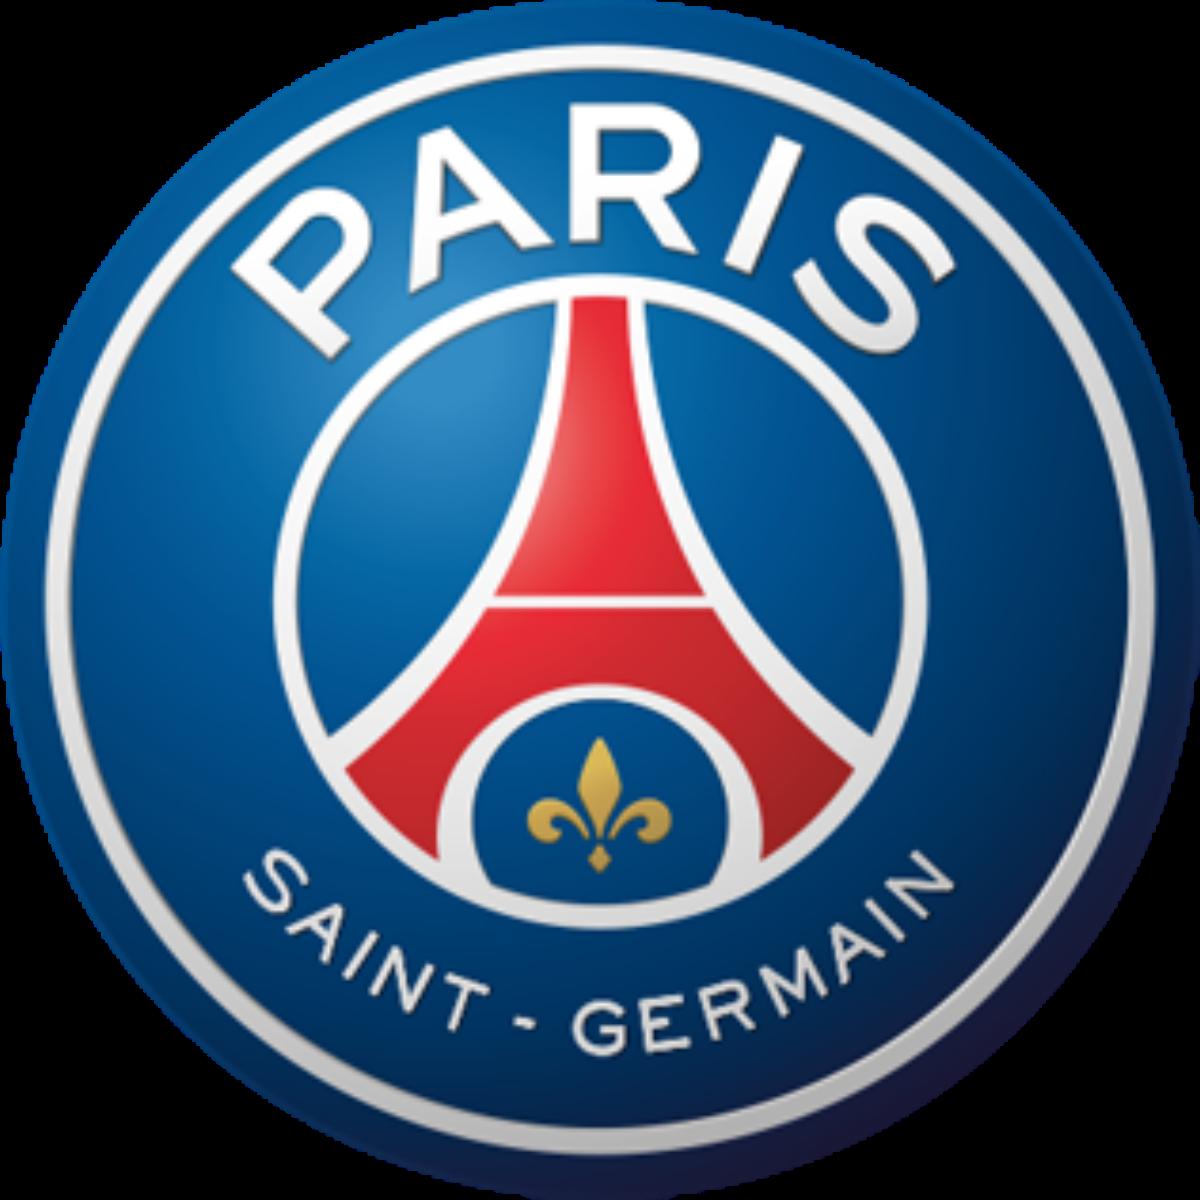 https://bizweb.dktcdn.net/100/072/140/collections/1200px-paris-saint-germain-f-c-svg.png?v=1532797137450